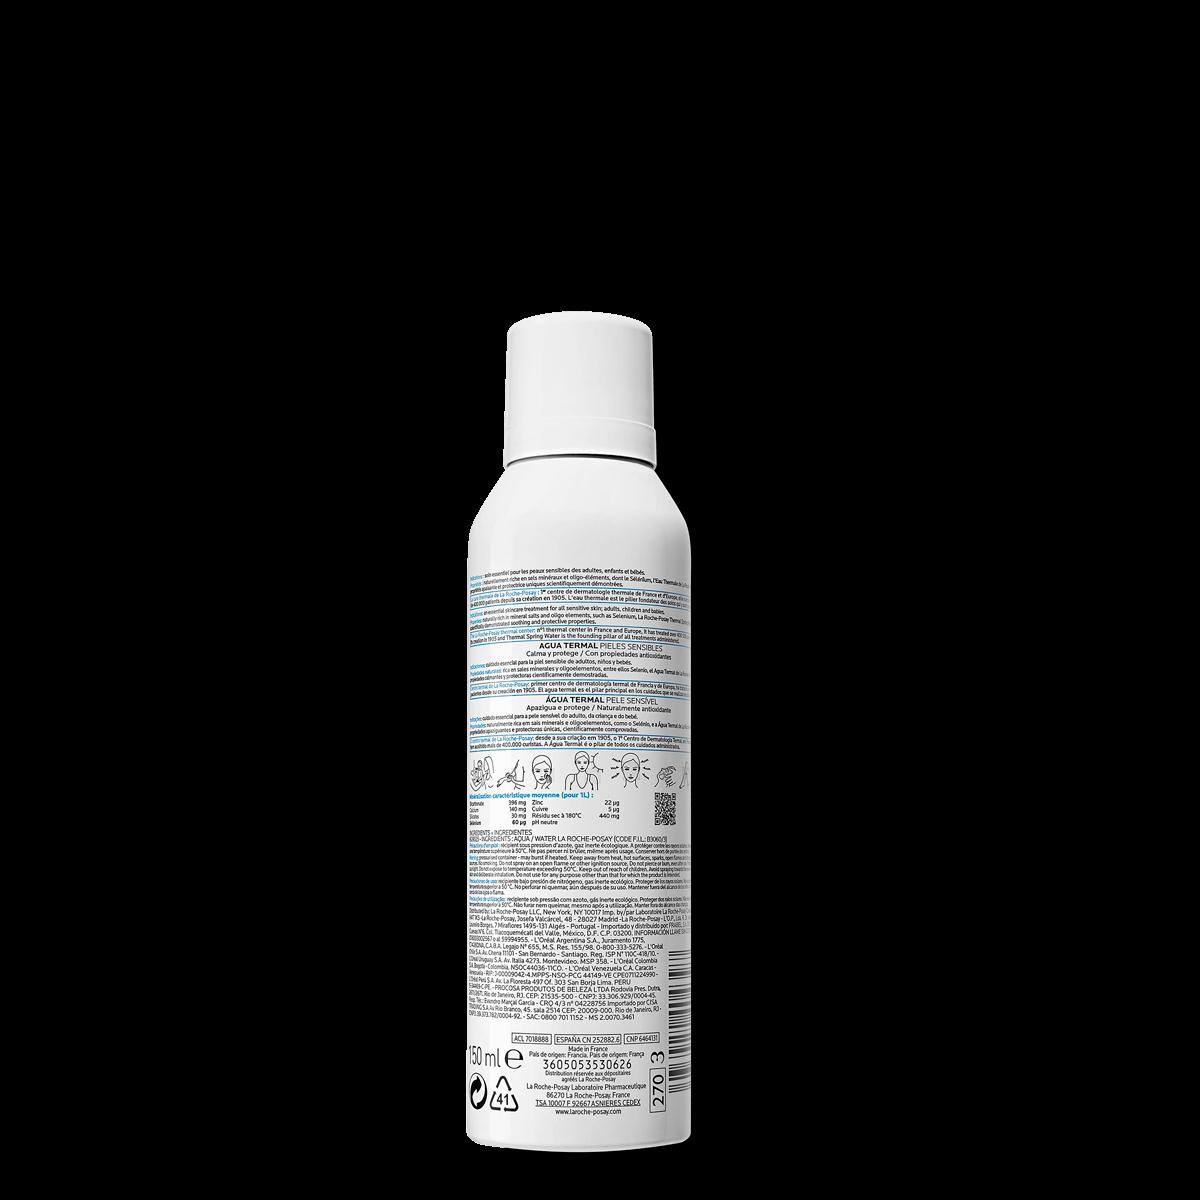 La Roche Posay ProduktSide Termalsk kildevann 150ml 3433422404397 Ba